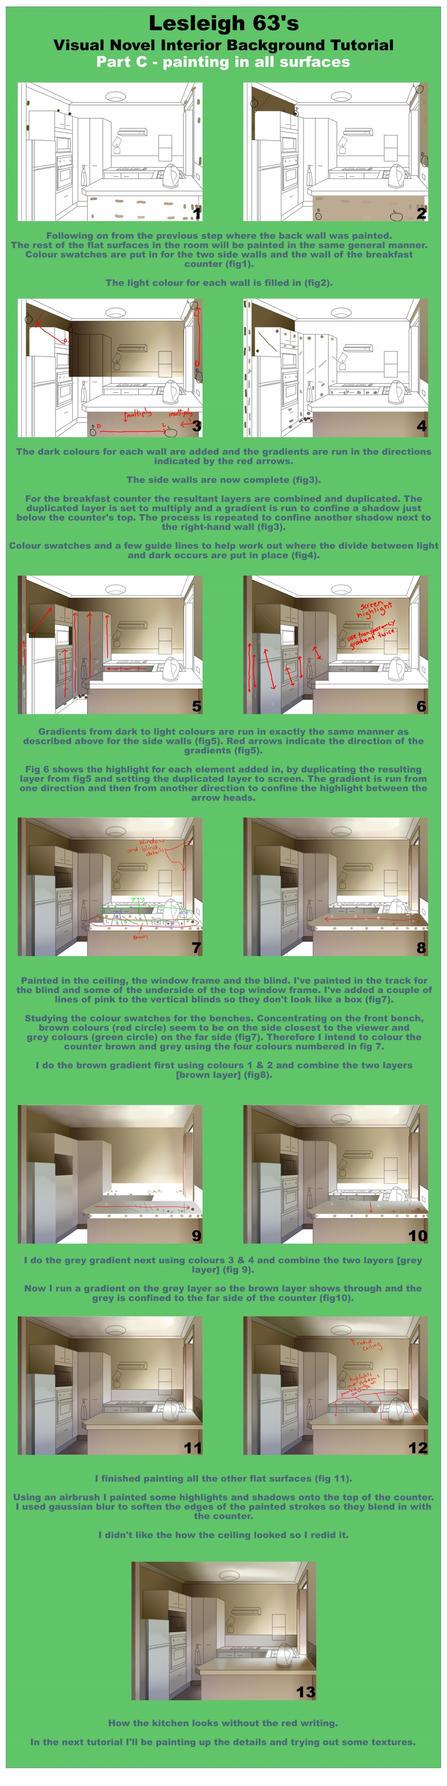 VN 2d background interior tutorial - Part C by Lesleigh63